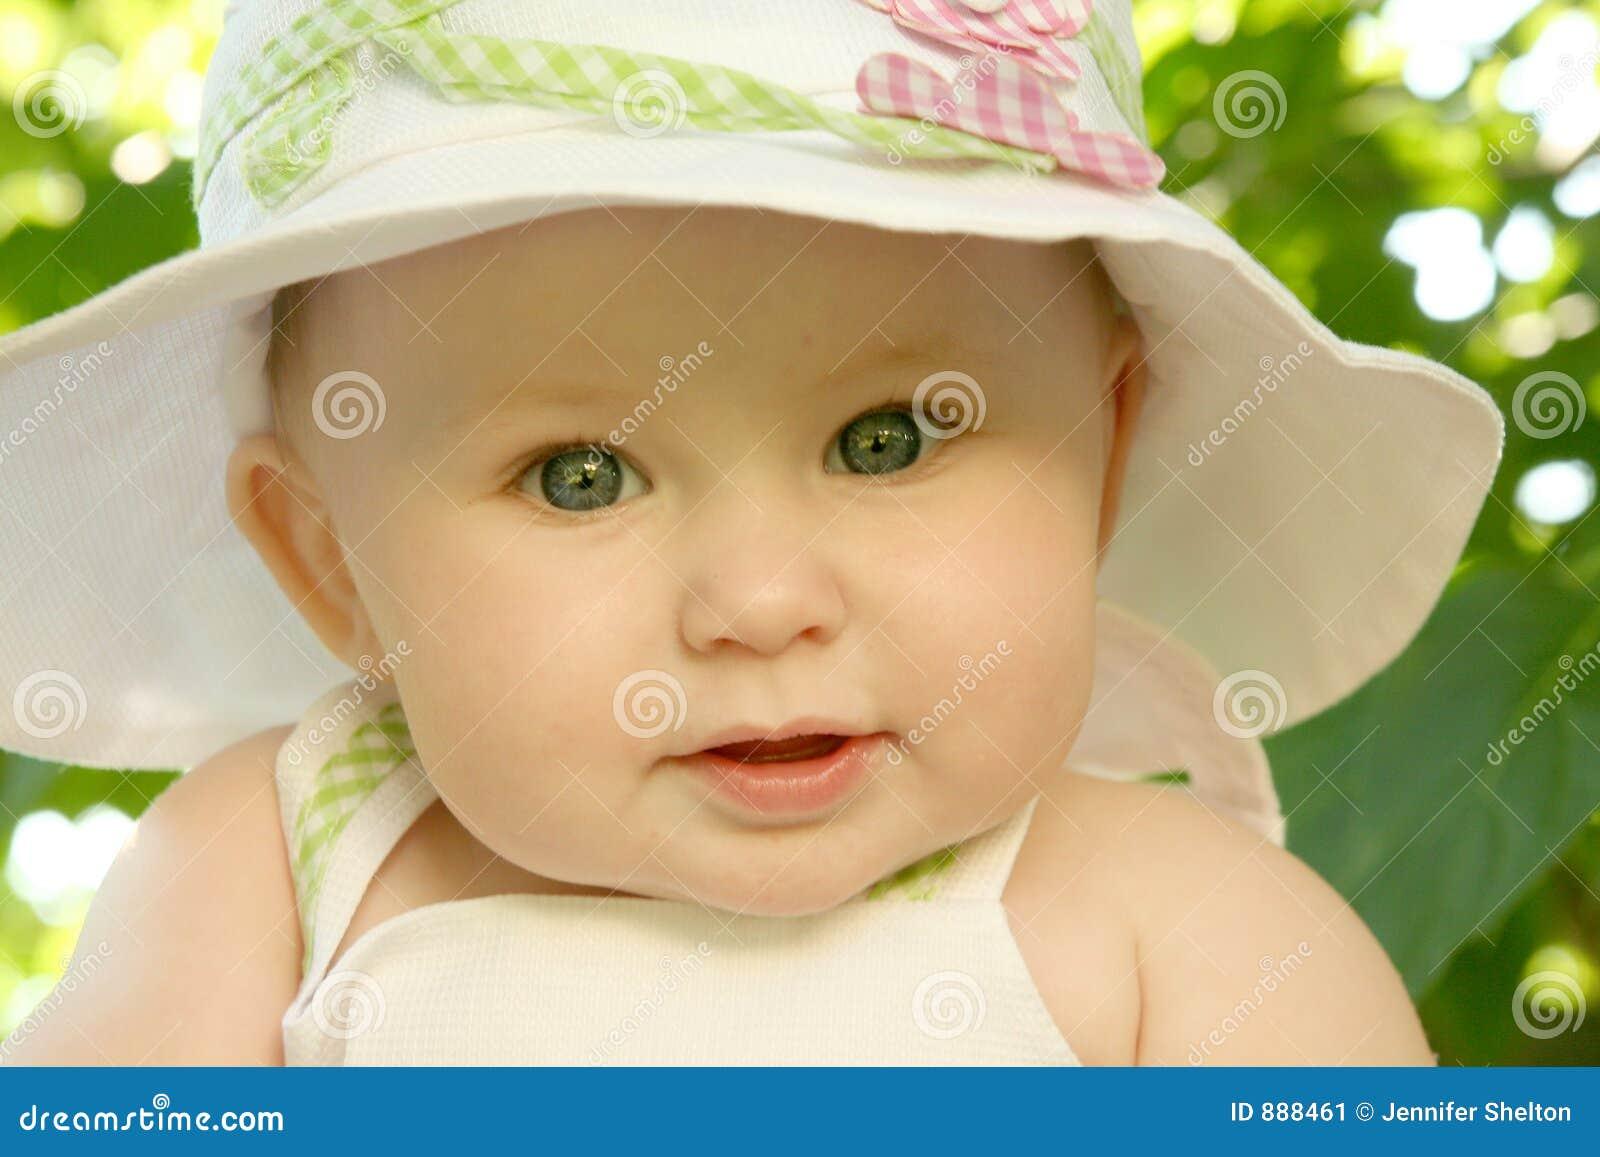 Pretty Baby Stock Image - Image: 888461